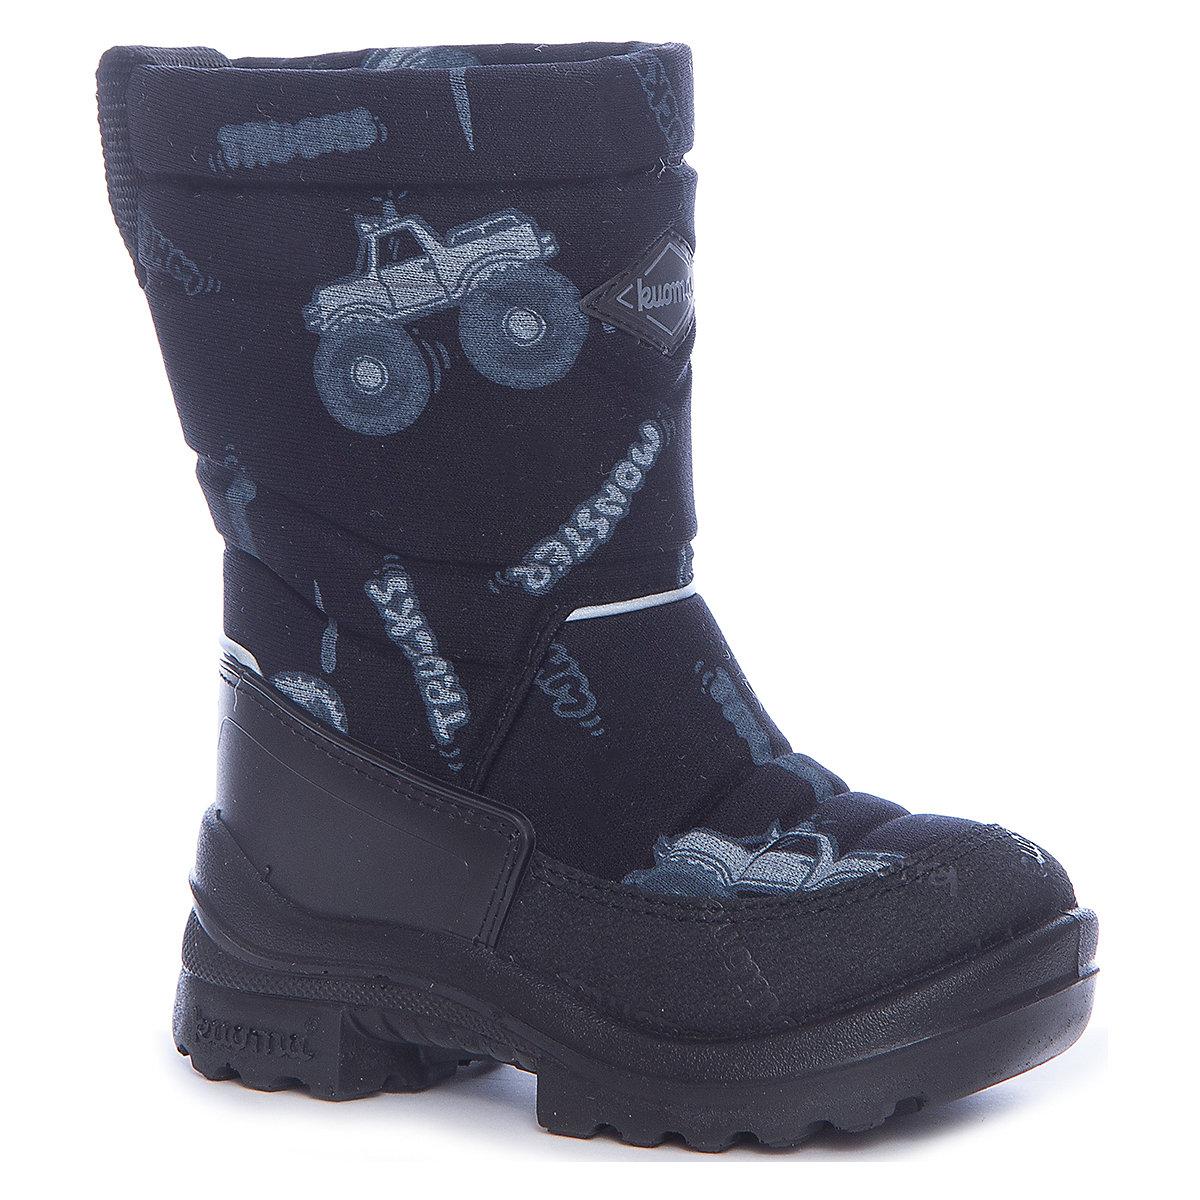 Boots KUOMA for boys 7047117 Valenki Uggi Winter shoes Children Kids MTpromo reima boots 8624989 for boys winter boy children shoes